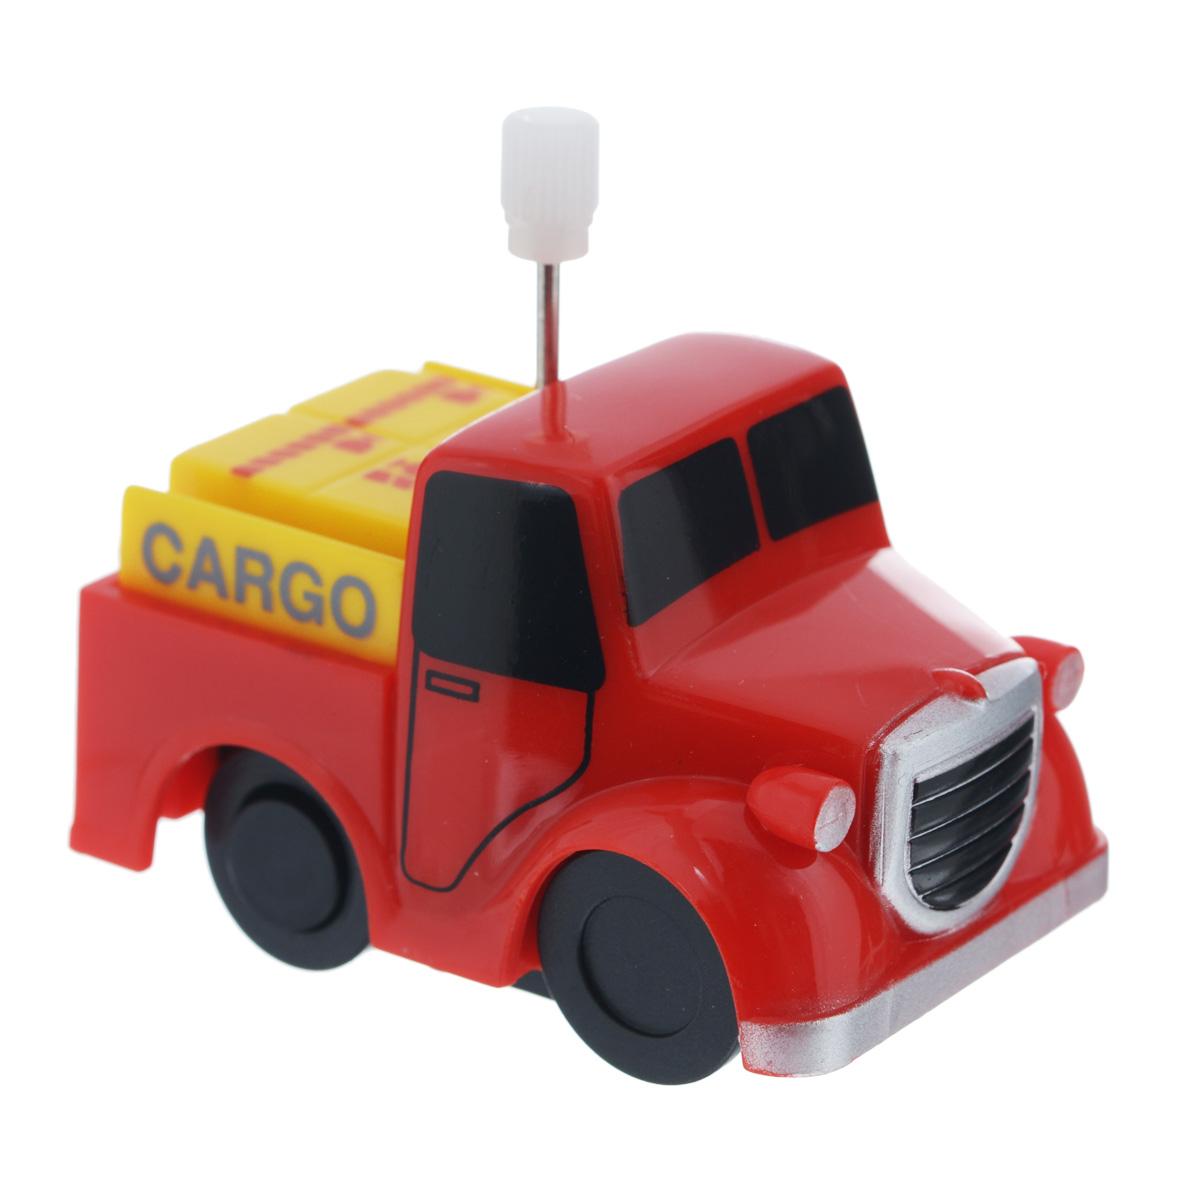 ������� �������� ���������� Cargo - Hans2K-012BD_ Cargo������� Hans ���������� Cargo ��������� �������� ������ ������ � �� �������� ��� �������! ����������� �� ����������� ��������, ������� ������������ ����� ����������. ������� ����� ������������ �����. ��� �������, ����������� ������, ��������� �������� ���� �� ������� ������� �� �����. ���������� ������� �� ����������� � ��� ������ ������. �������� ������� Hans ���������� Cargo ������� ������� � �������� �����������, ������ �������� ���, ������������ �������� � ��������� ����������.